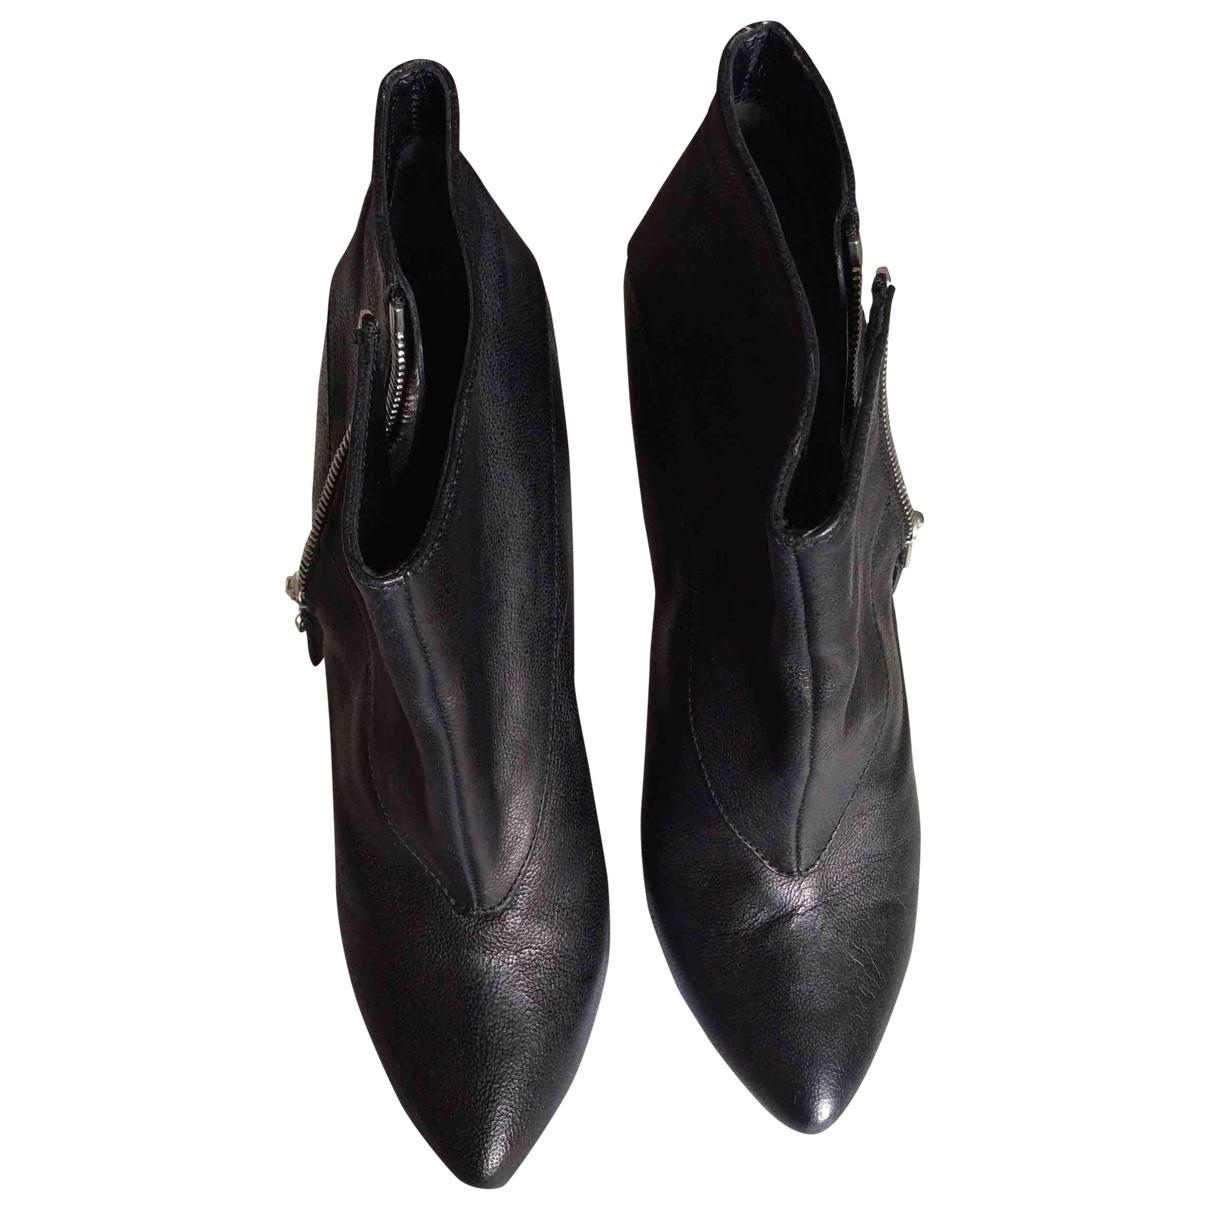 Balenciaga \N Black Leather Ankle boots for Women 38.5 EU